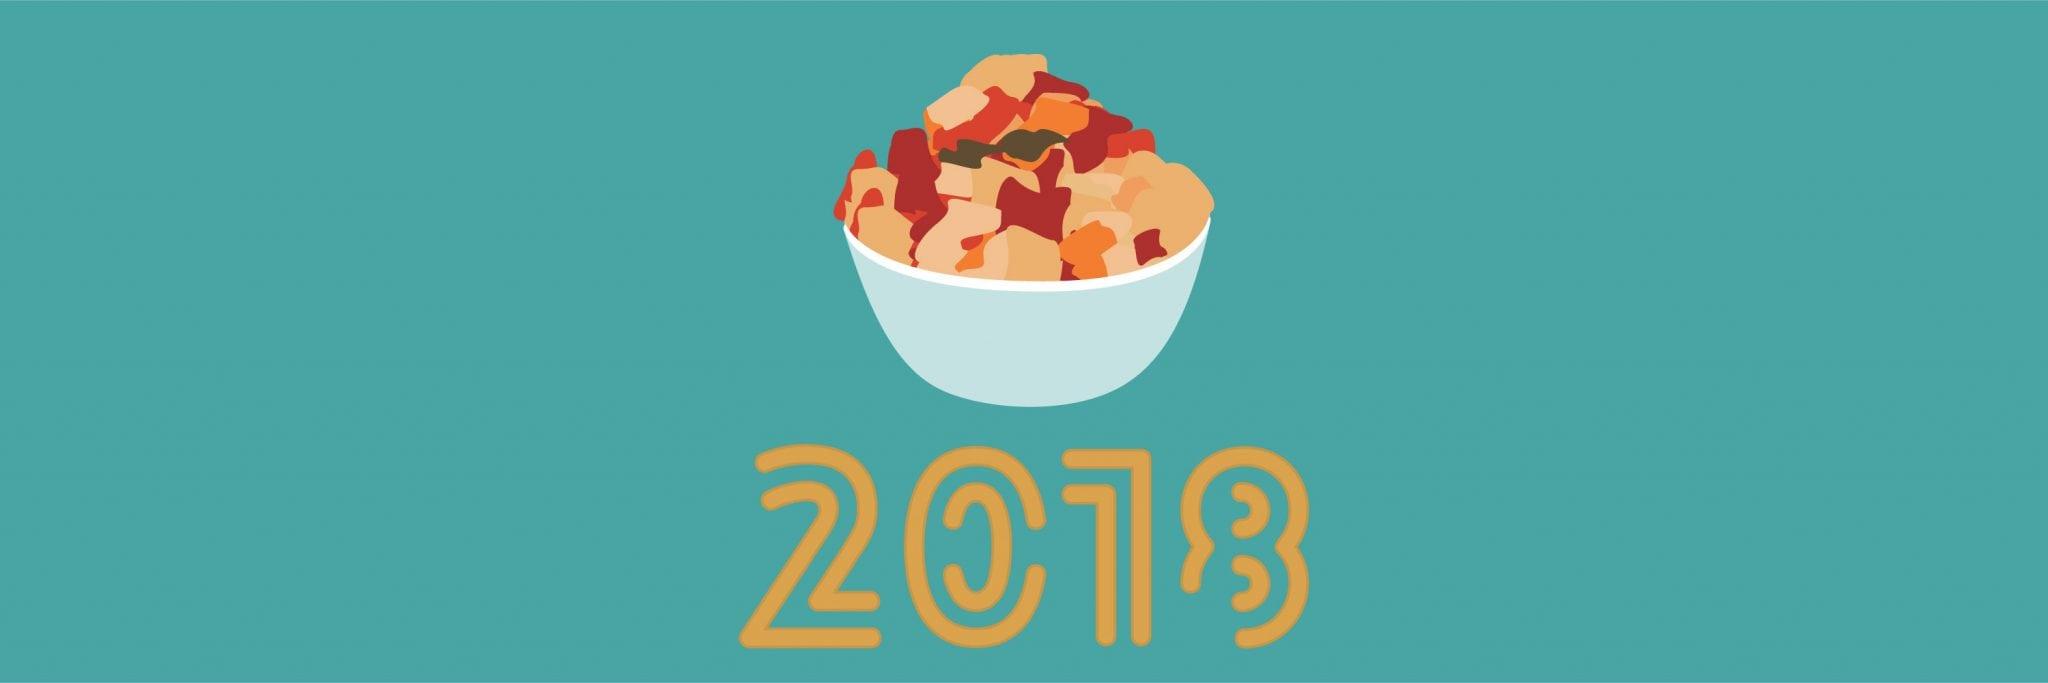 Best 2018 Food Trends | Blue Orbit Restaurant Consulting